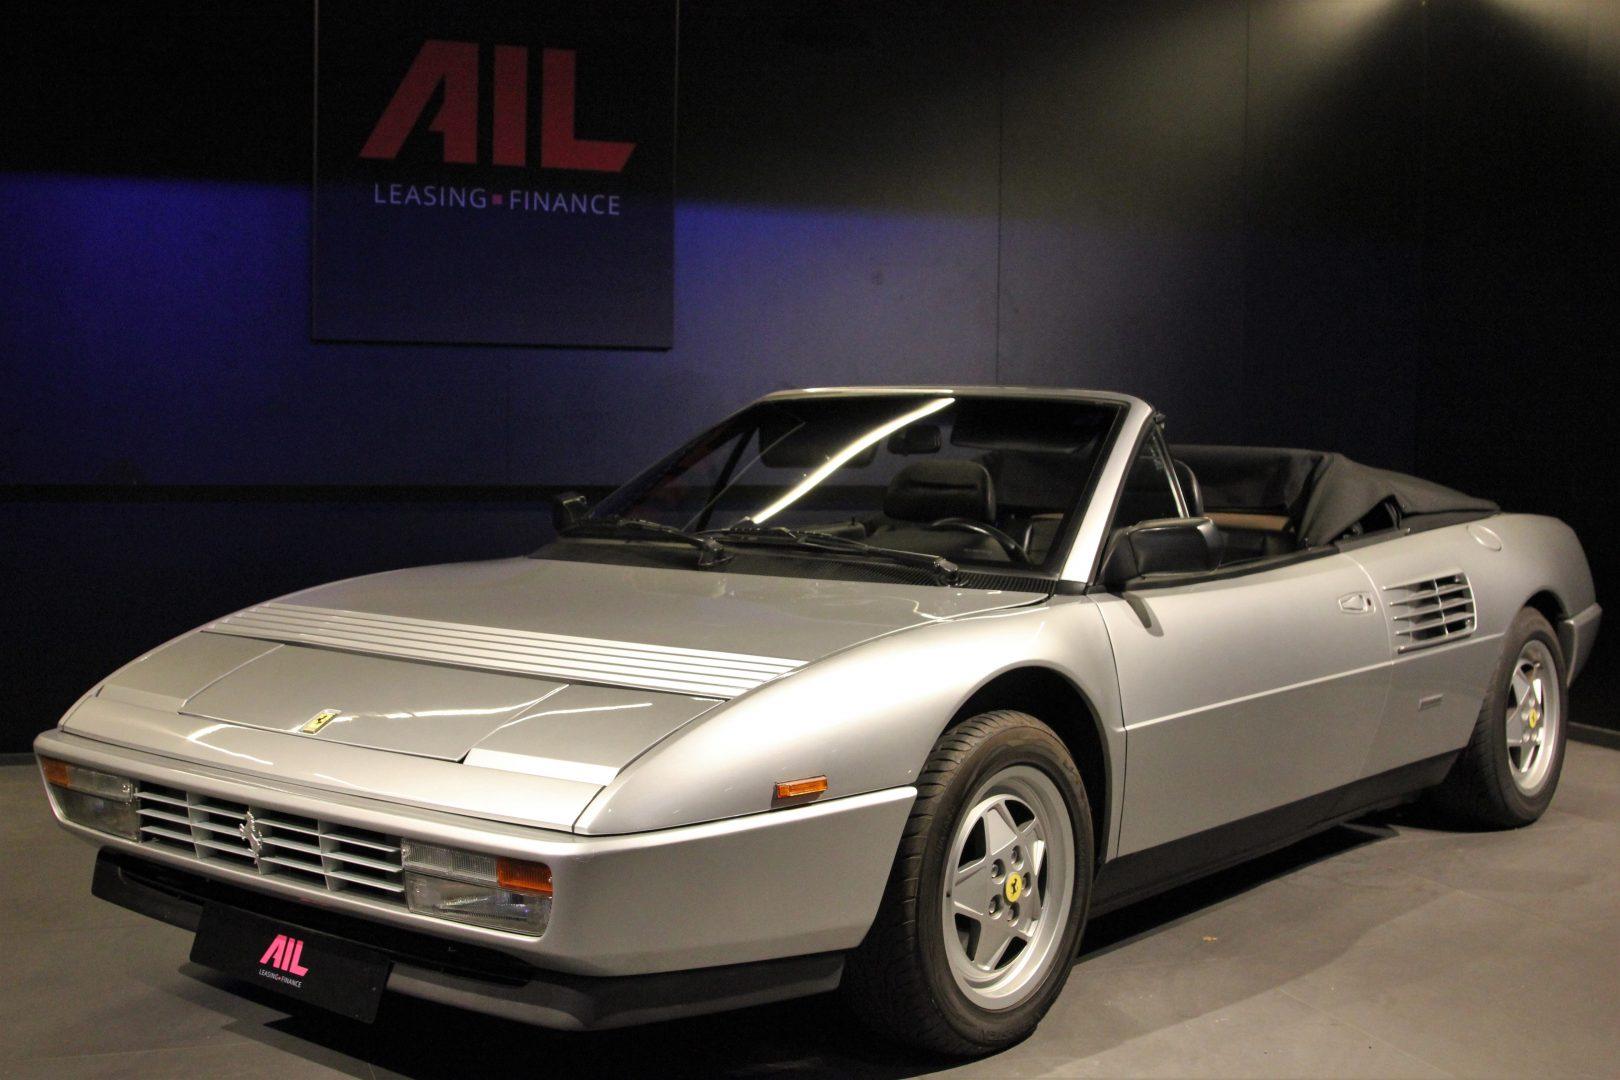 AIL Ferrari Mondial T Cabriolet 3,4 V8 14